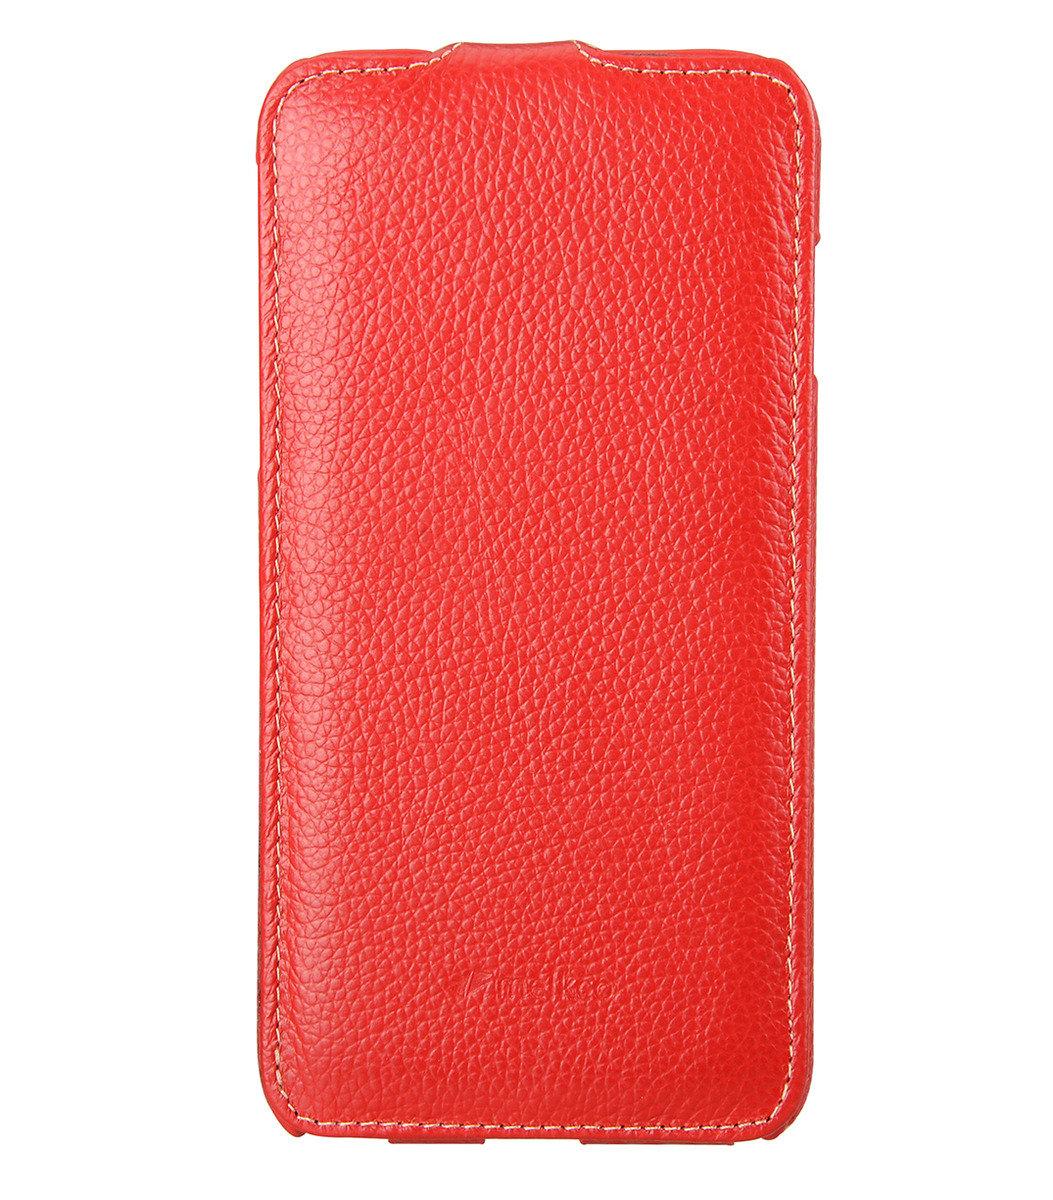 Apple iPhone 6 Plus/6s Plus  (5.5'') Jacka Type 高級真皮革手機套 (紅色荔枝條紋)